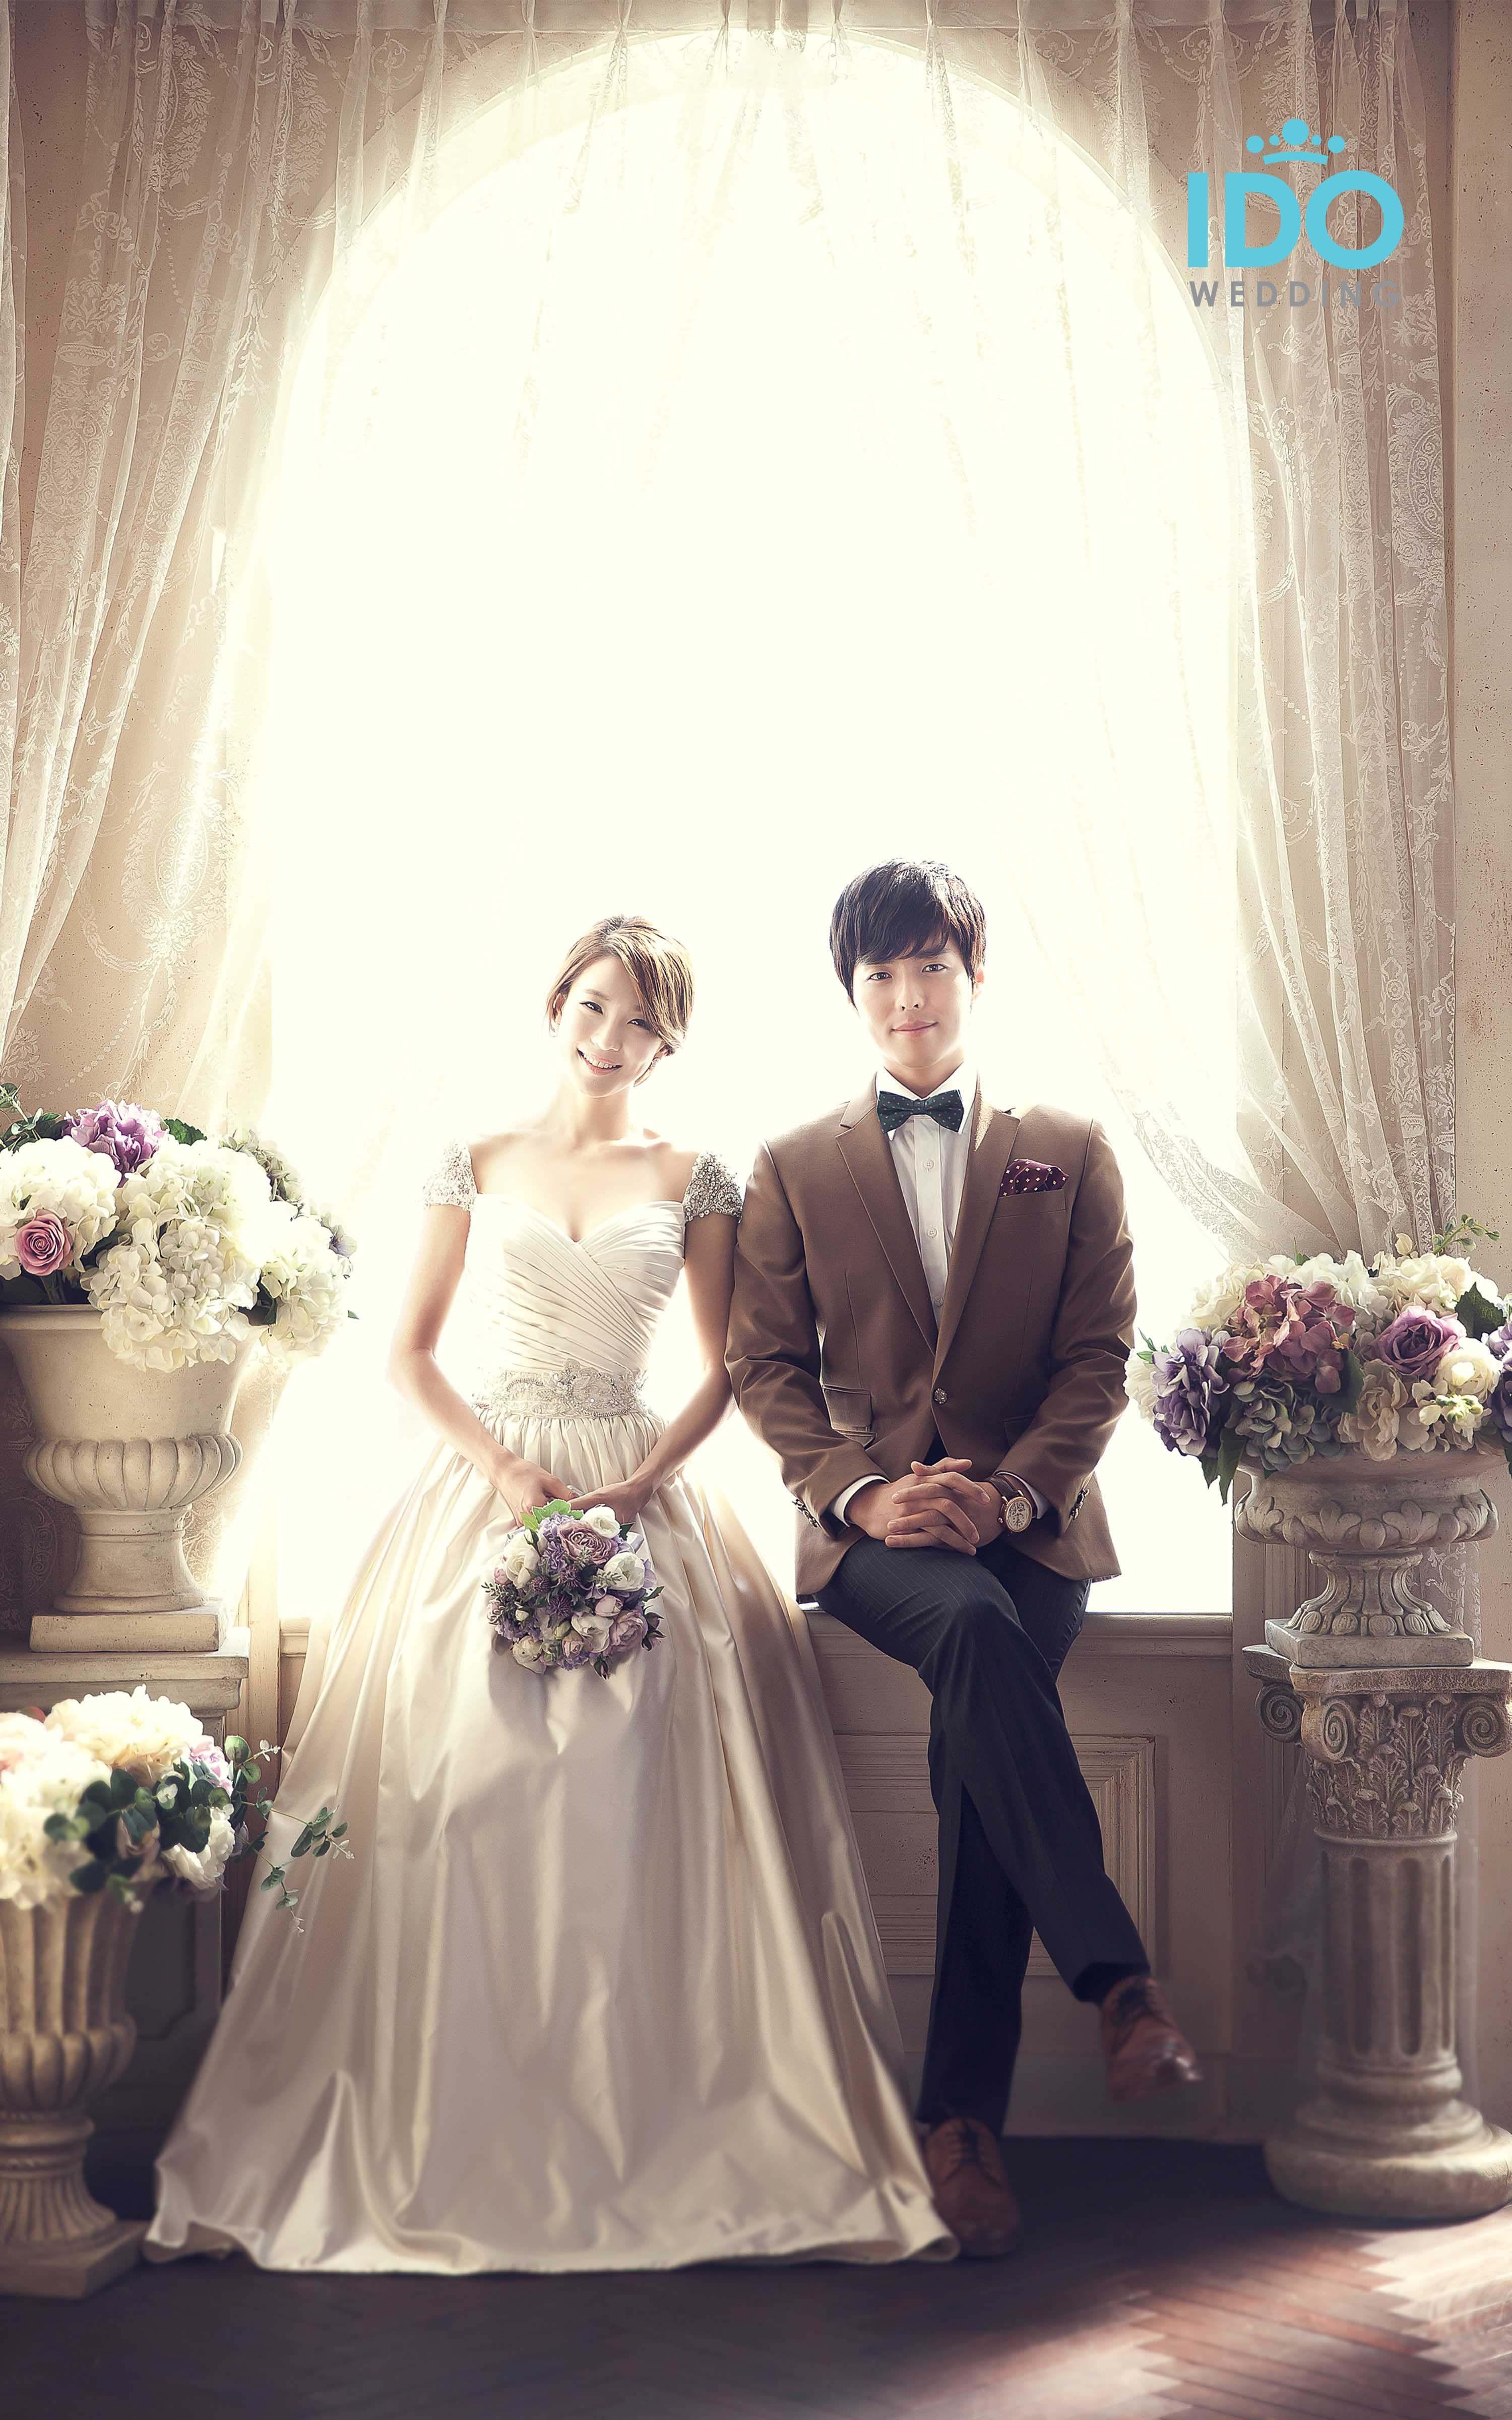 Korean Concept Wedding Photography Idowedding Www Ido Wedding Com Tel 65 6452 0028 82 70 8222 0852 Email Askus Ido Wedding Com Dugun